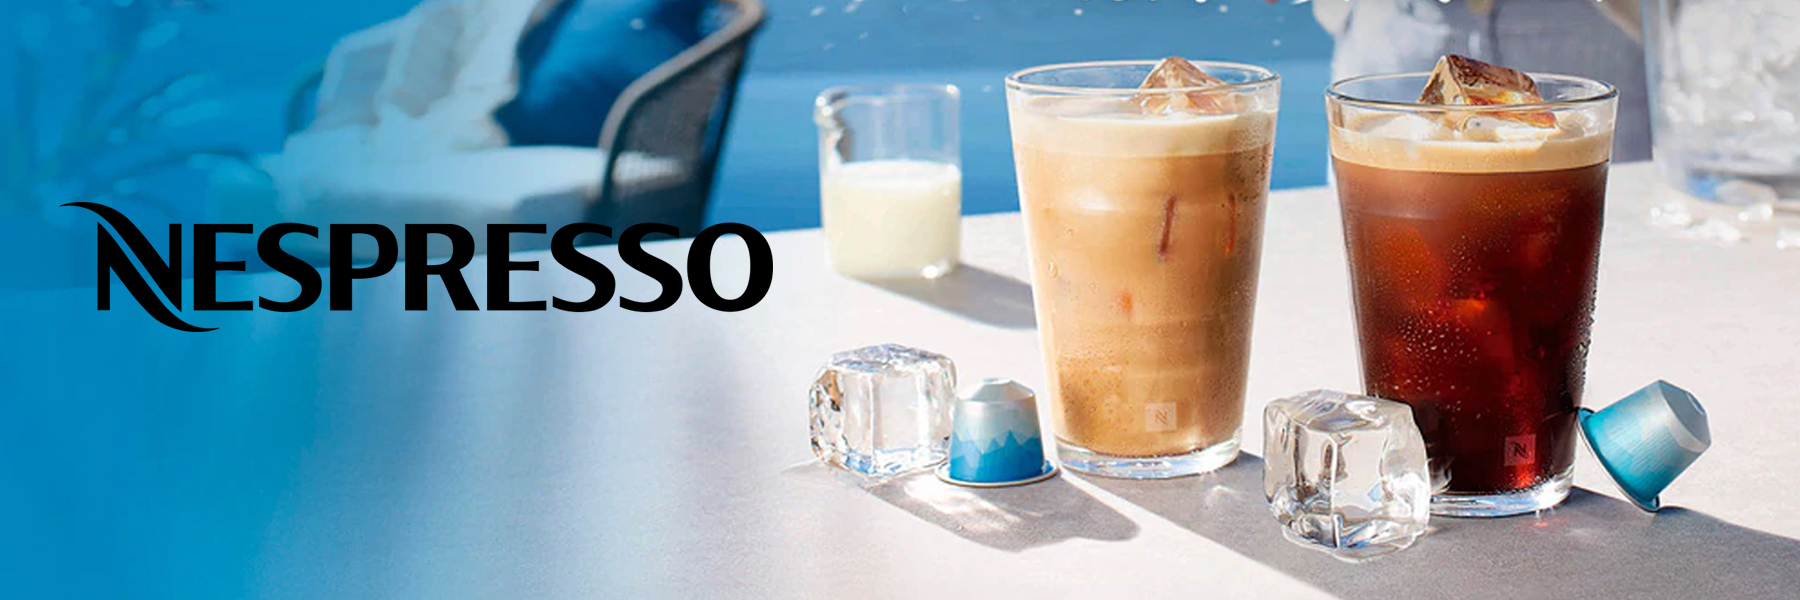 Nespresso. ¡Ahorra 20€ con tu primer pedido!